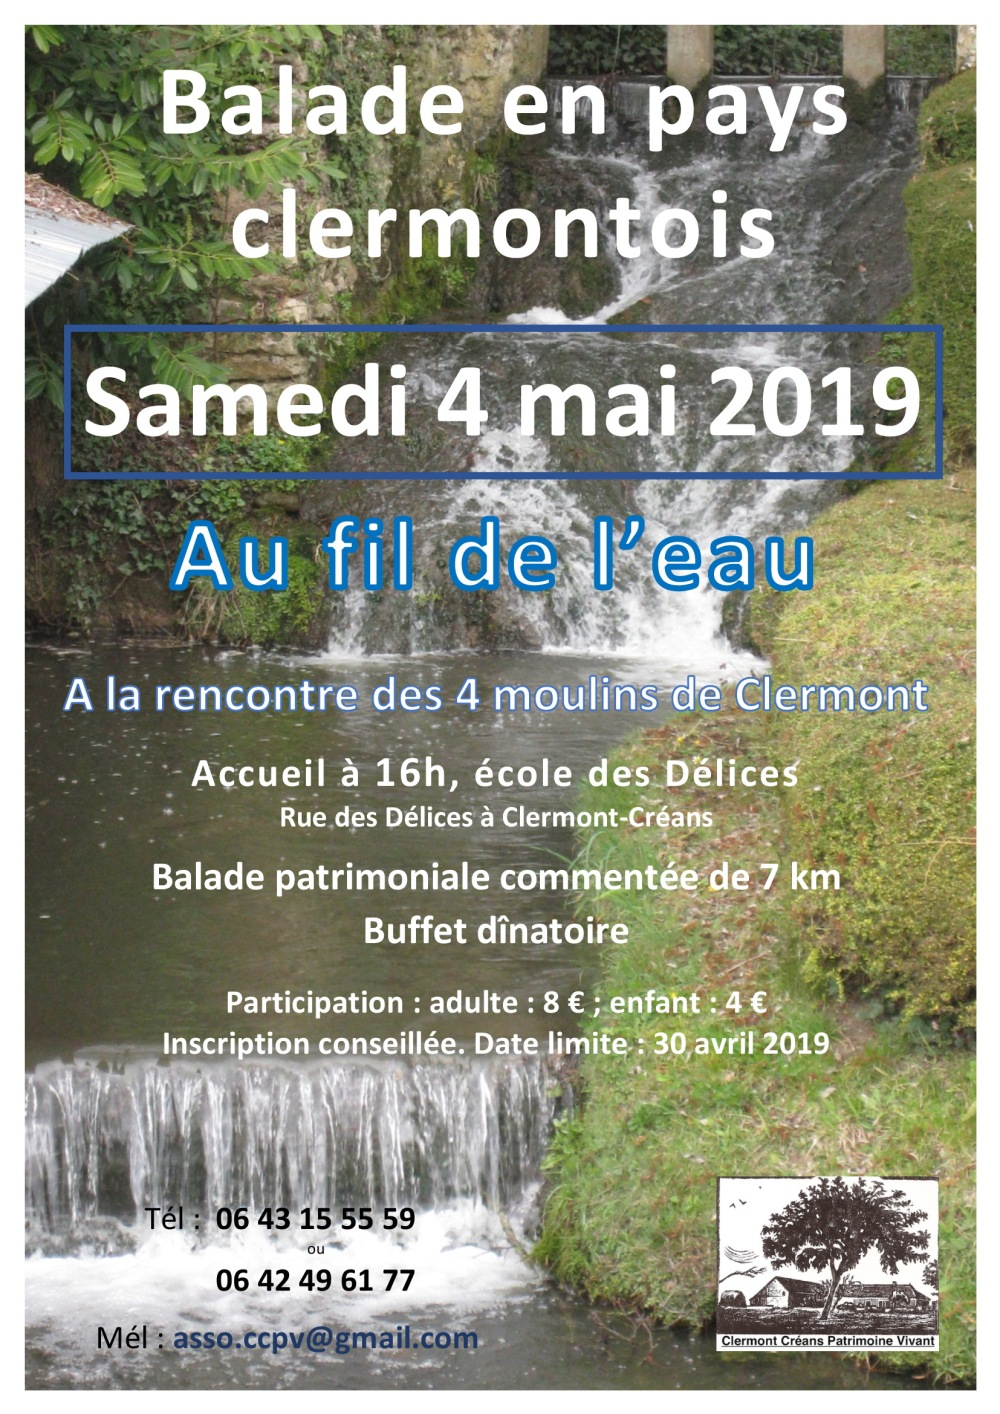 balade-en-pays-clermontois-2019 (2)